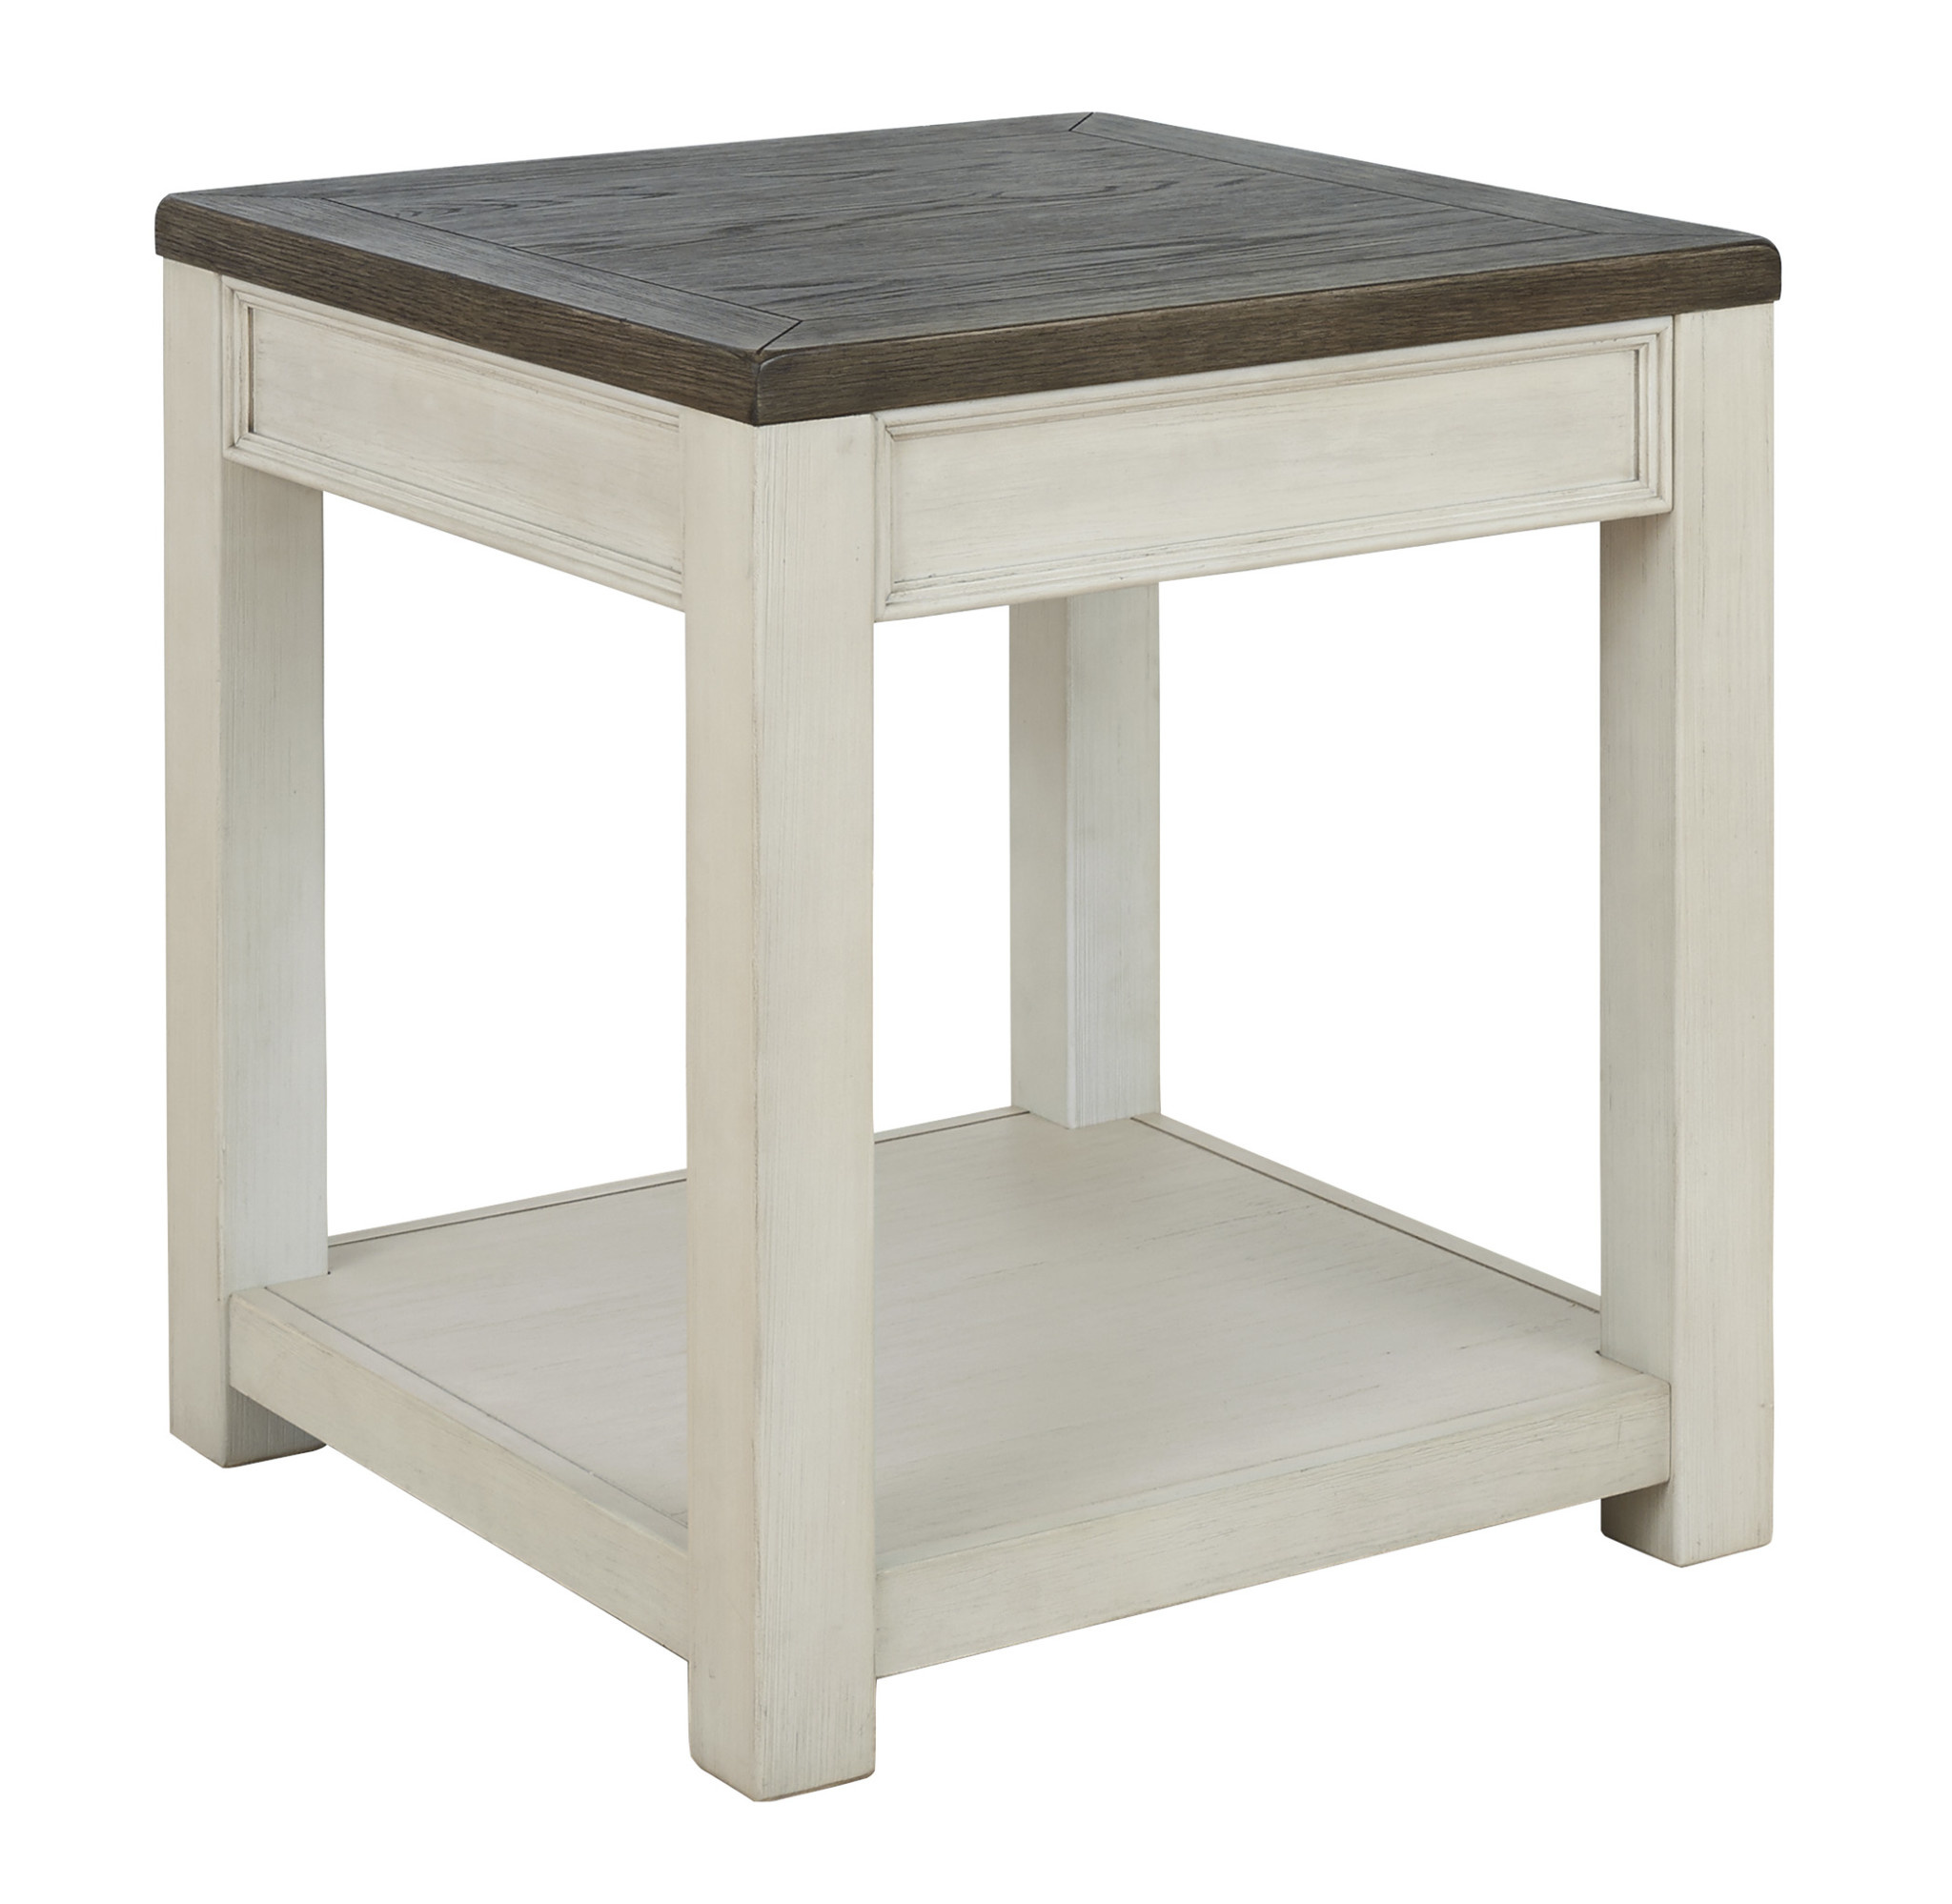 "Signature Design ""Bolanburg"" End Table- Brown/White T751-2"